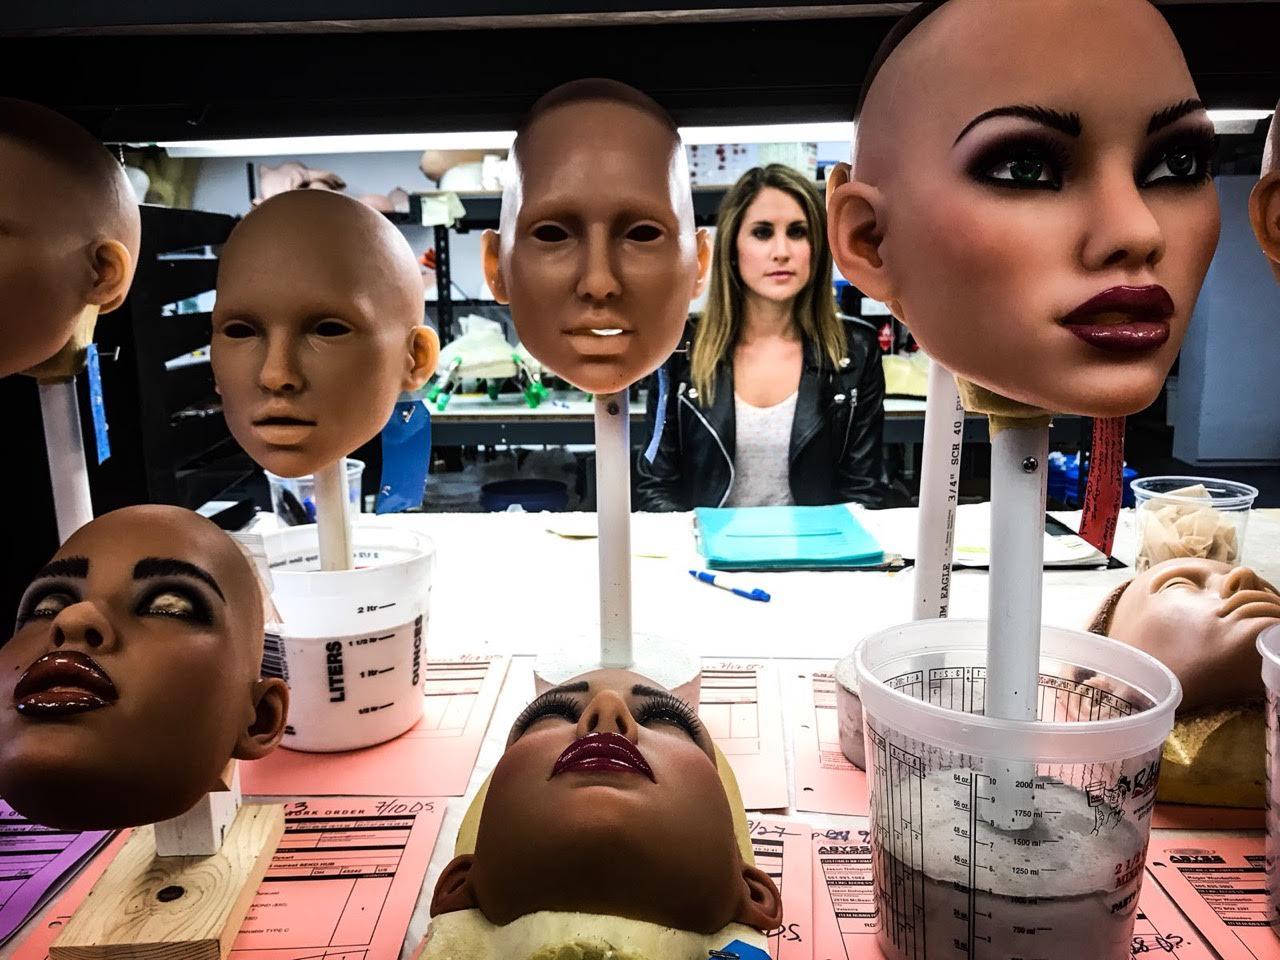 Stativer med syntetiske, menneskelignende ansikter som skal benyttes på roboter. Foto.